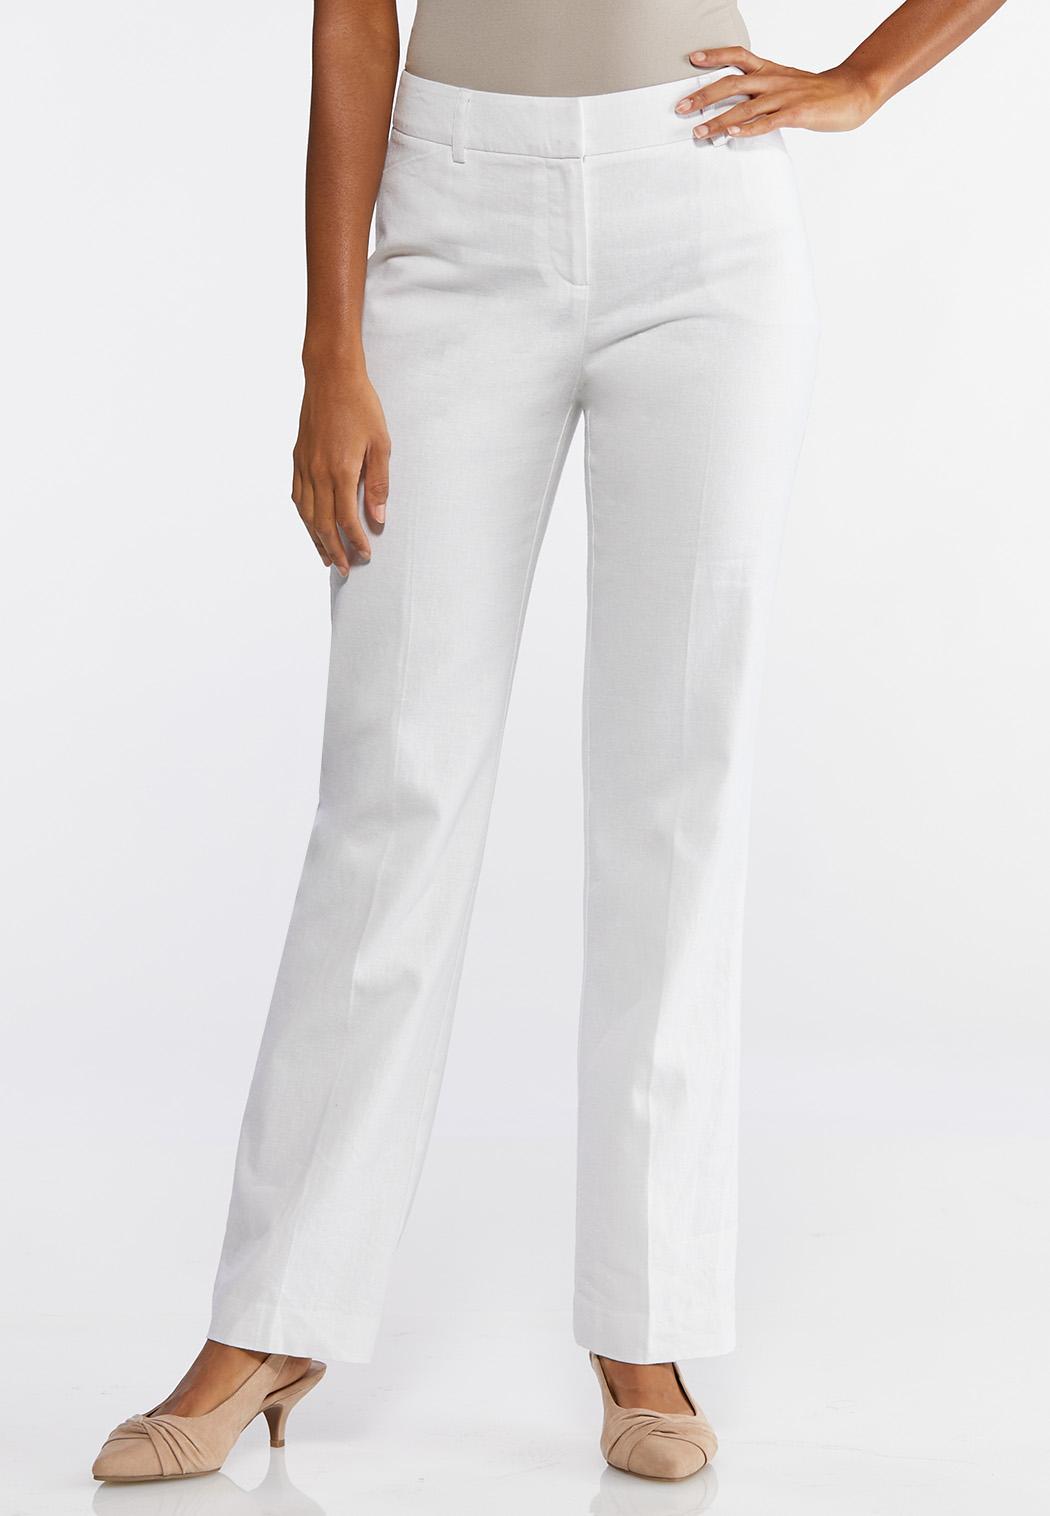 14eecaa738 Petite White Linen Trouser Pants Pants Cato Fashions